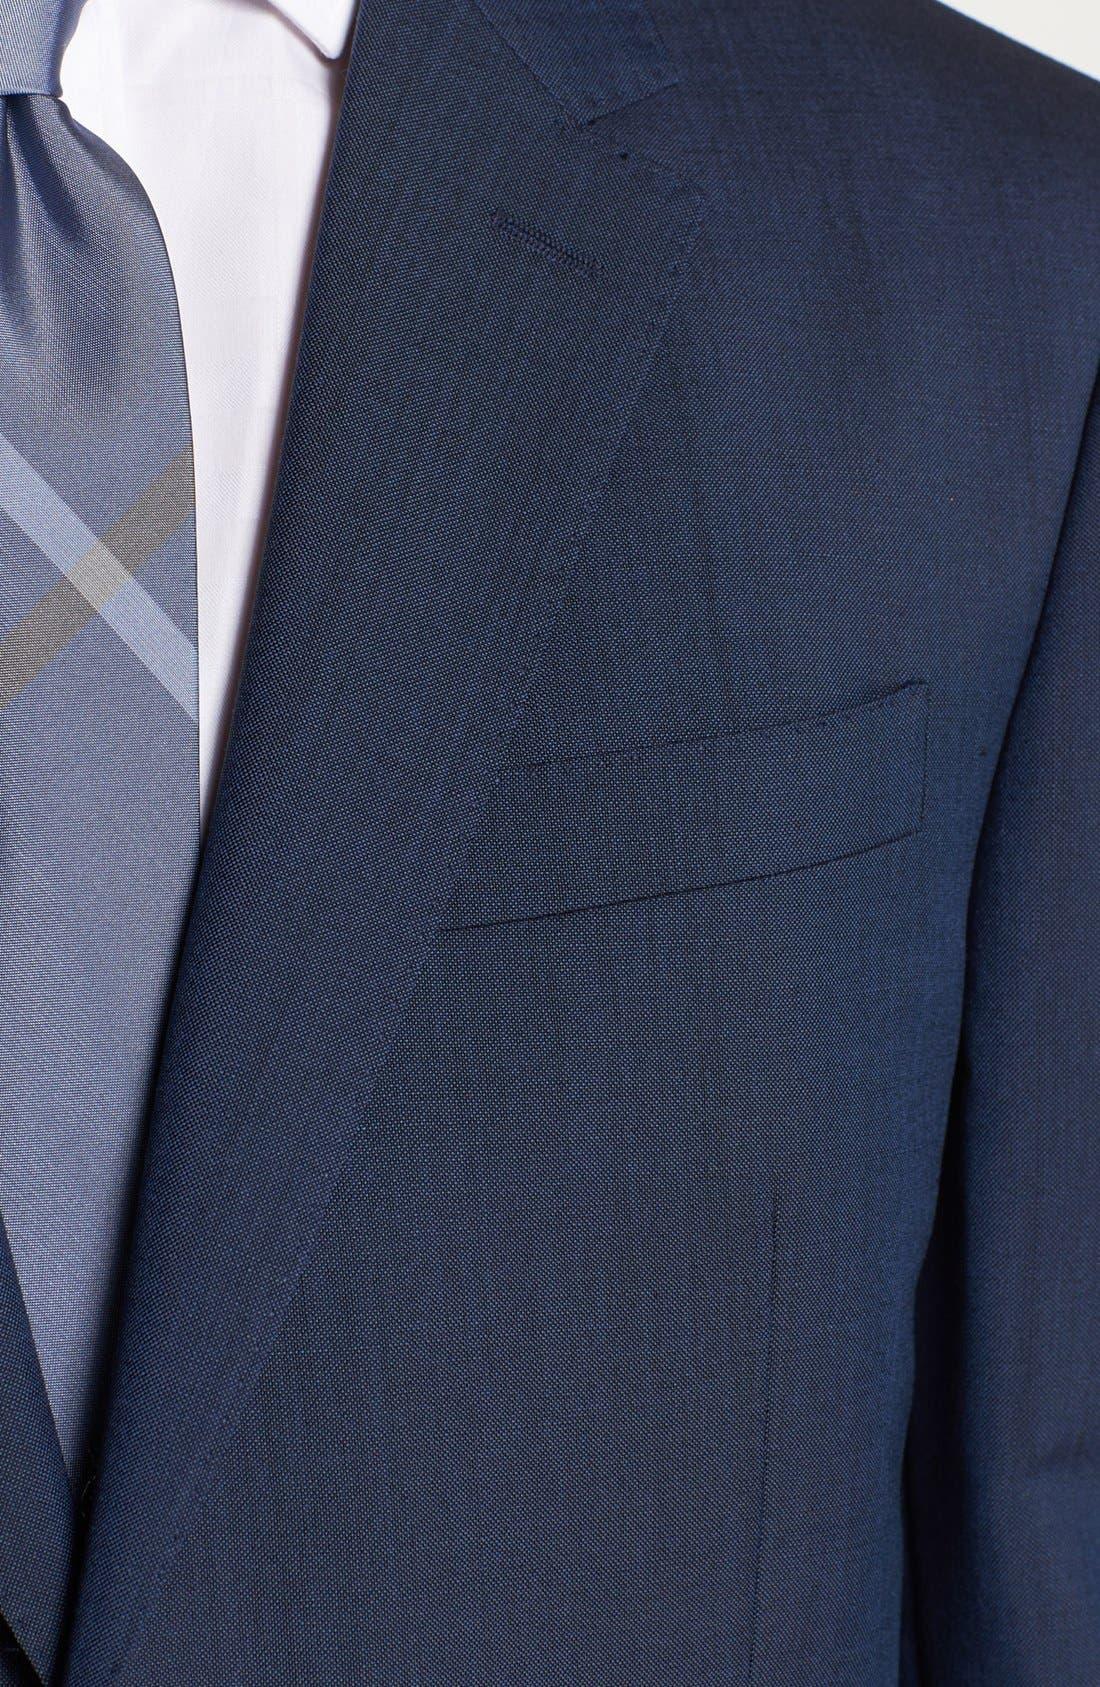 Alternate Image 2  - Burberry London Wool & Mohair Suit